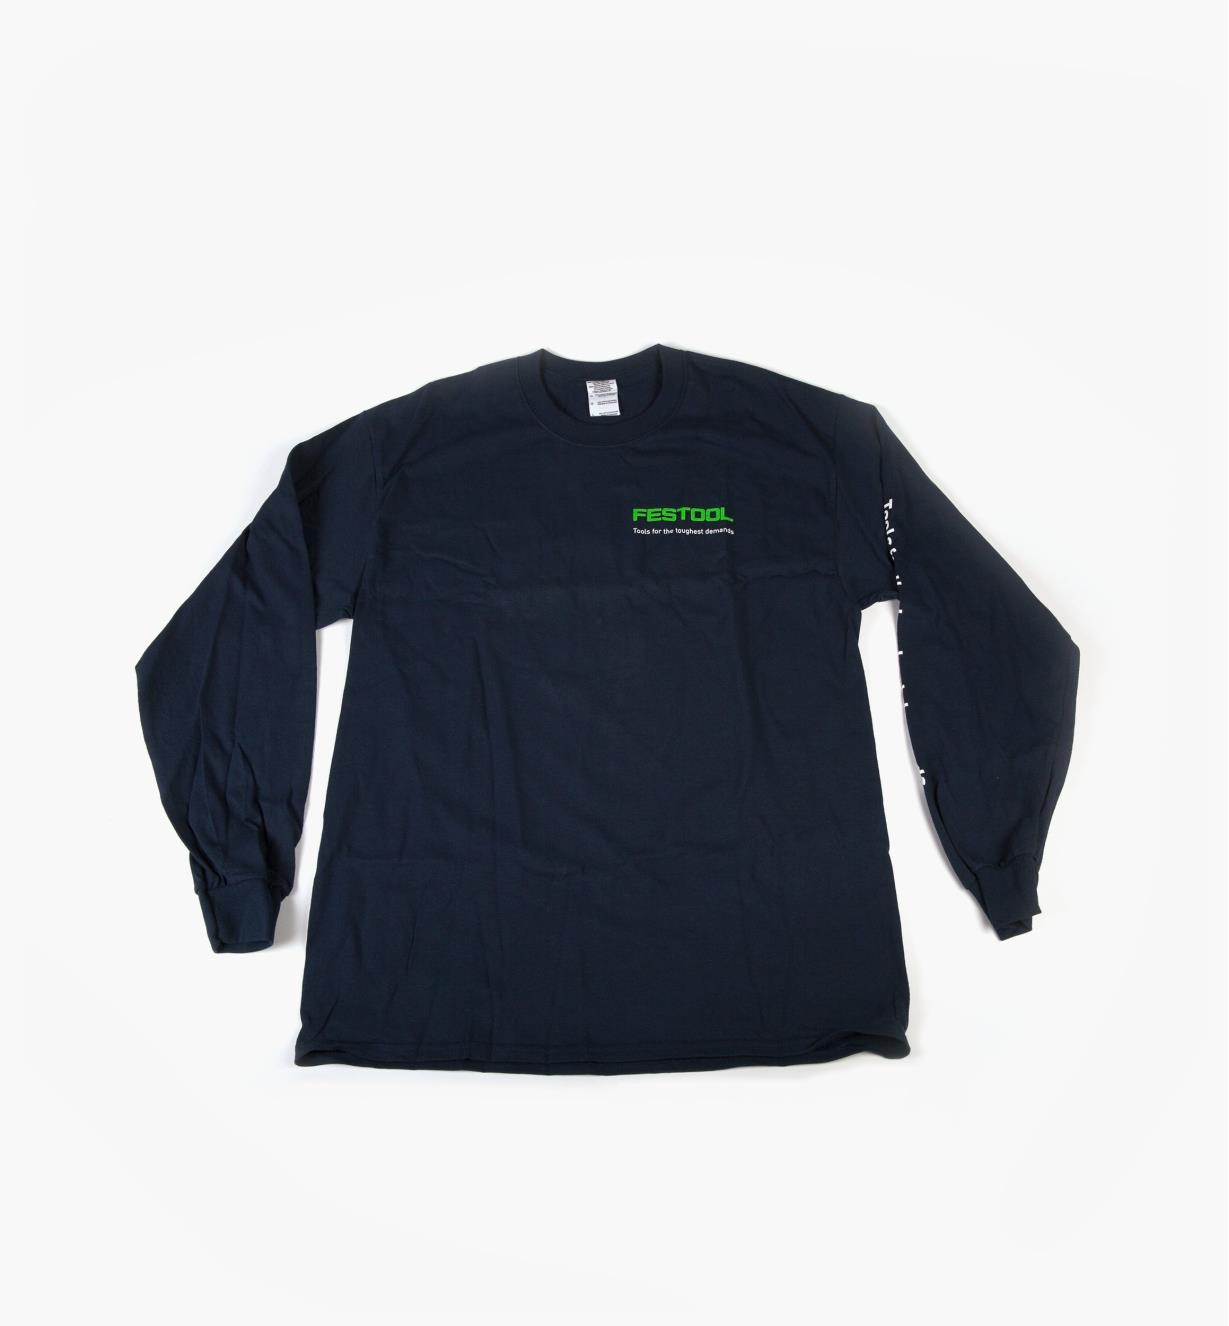 ZAM0630 - Festool Long-Sleeve Shirt, Large